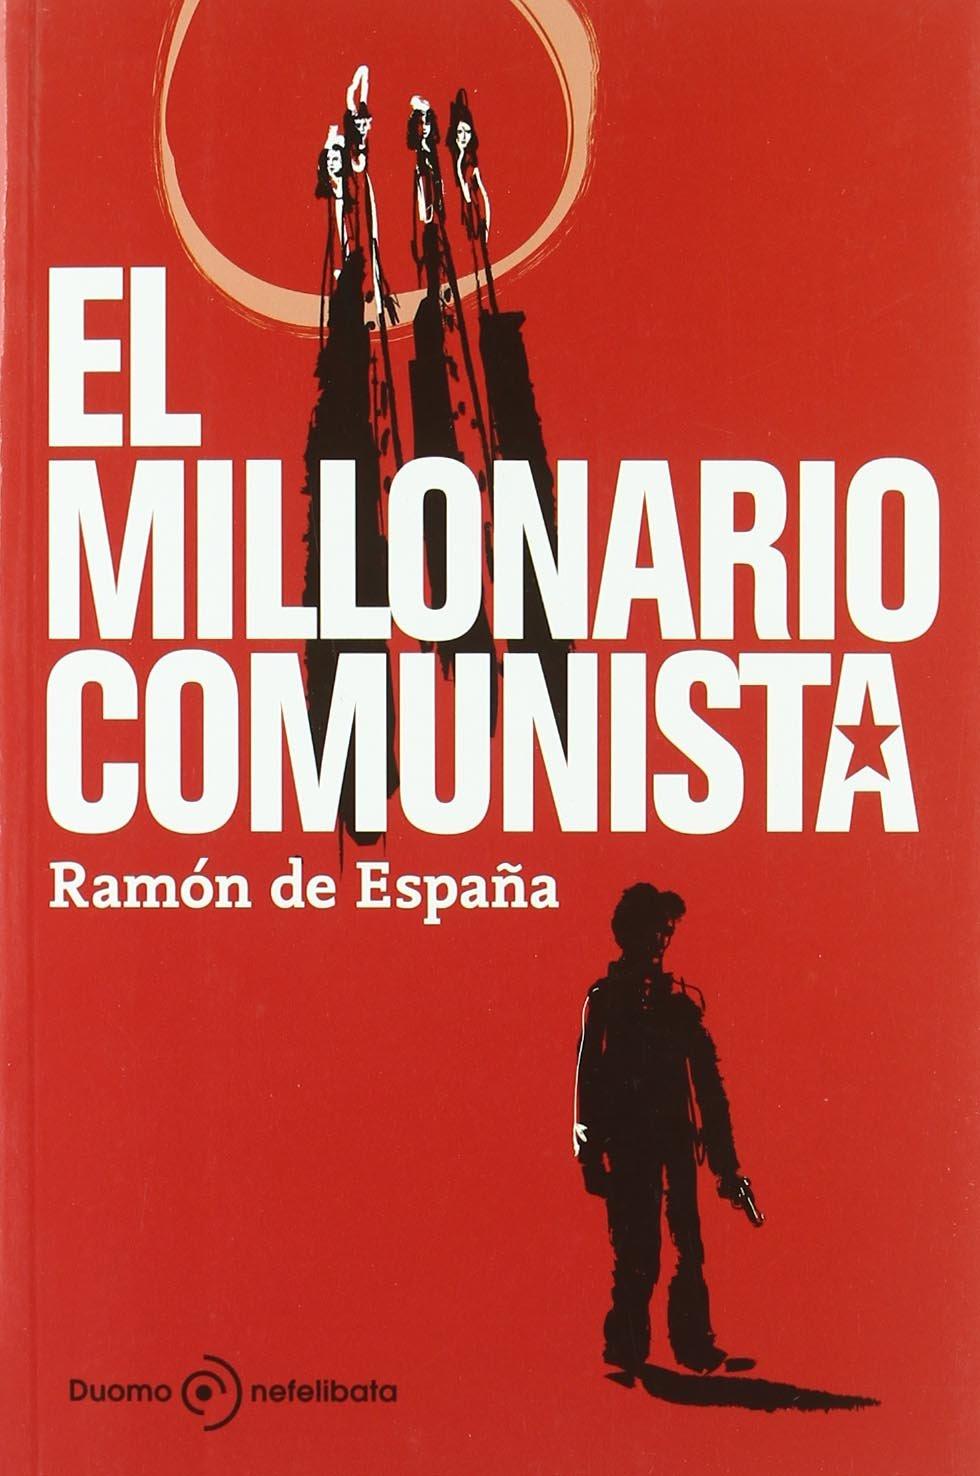 Millonario Comunista,El (Nefelibata (Duomo)): Amazon.es: España, Ramón de: Libros